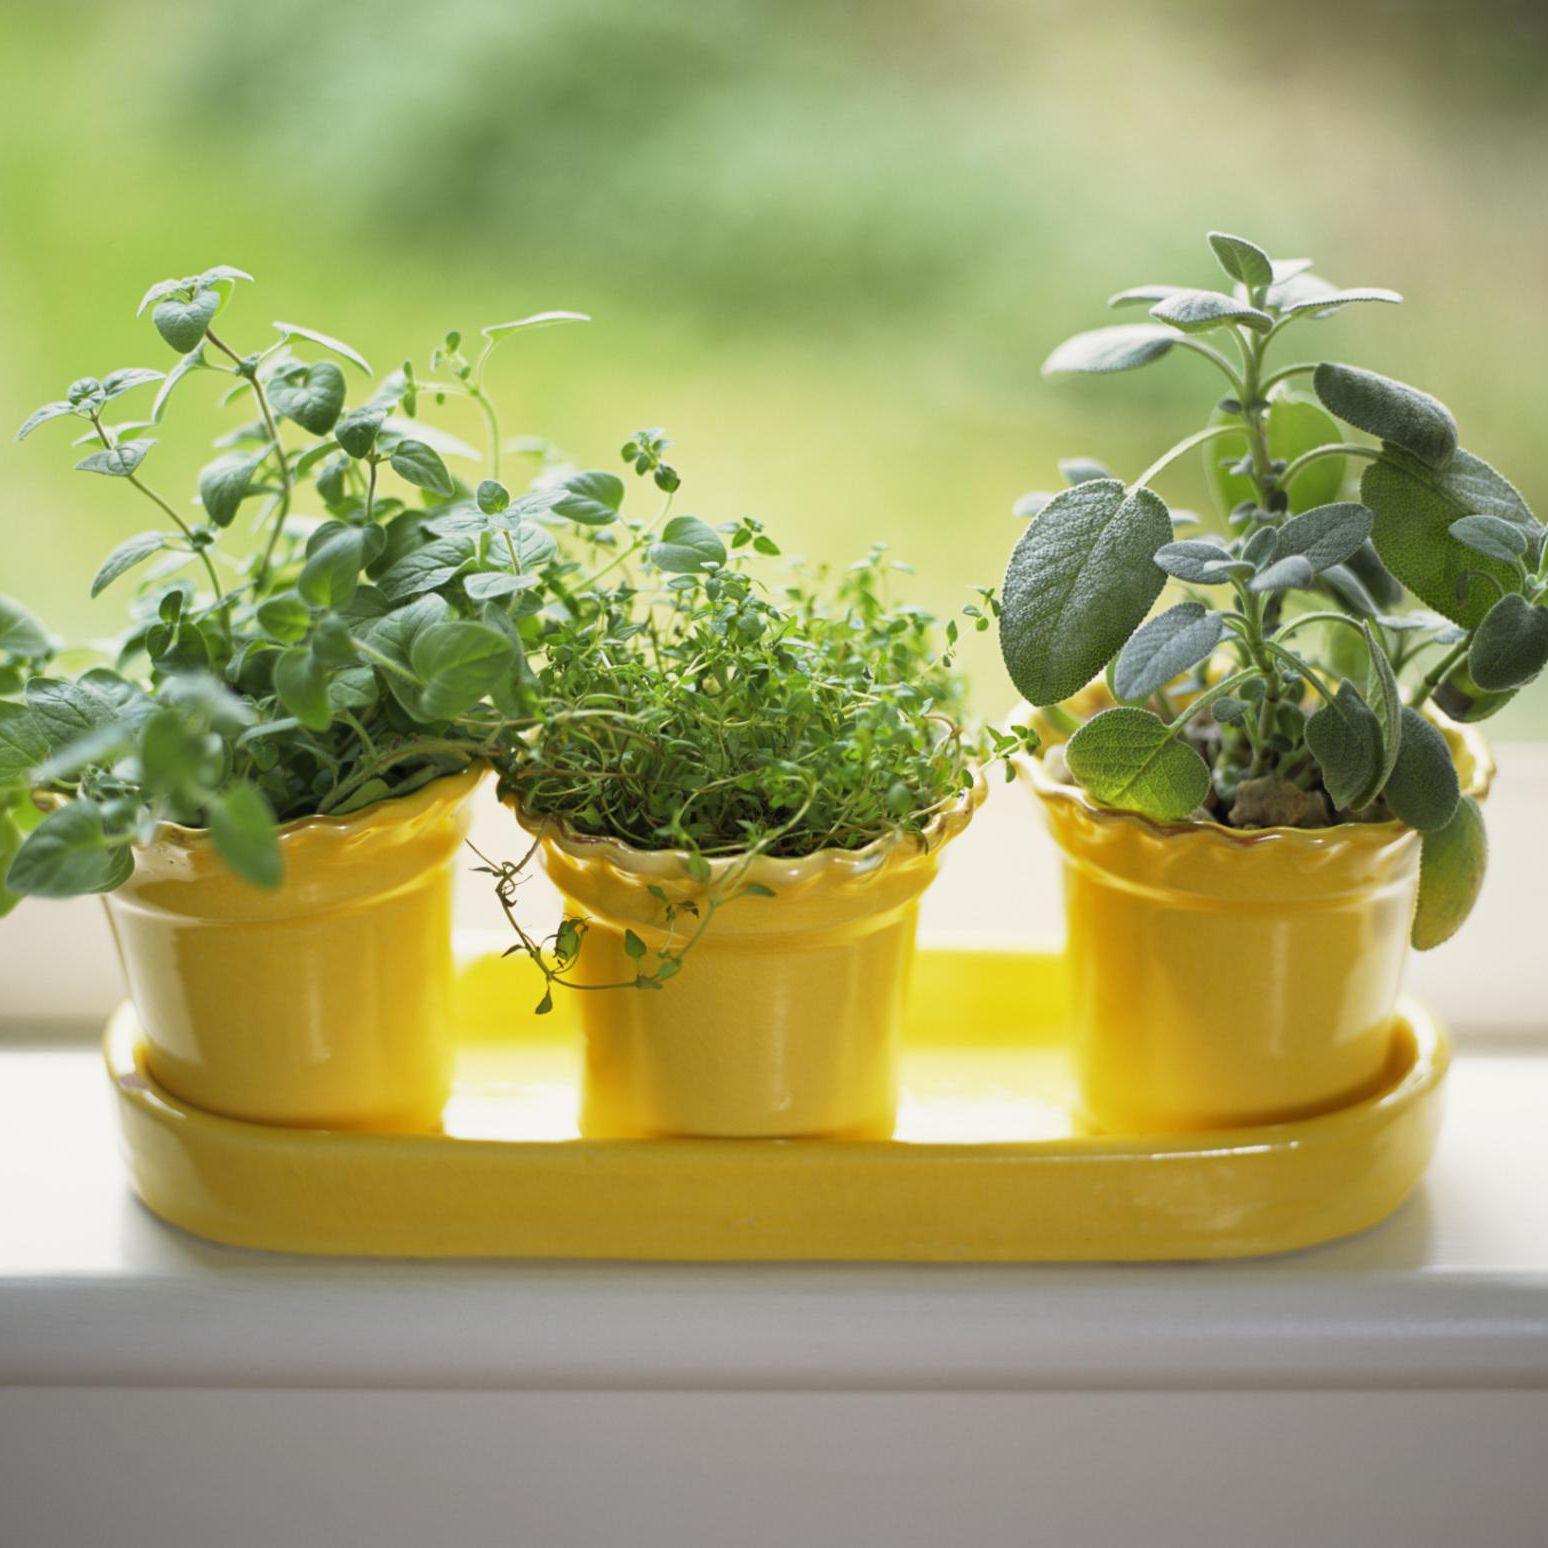 Grow Herbs Indoors On A Sunny Windowsill